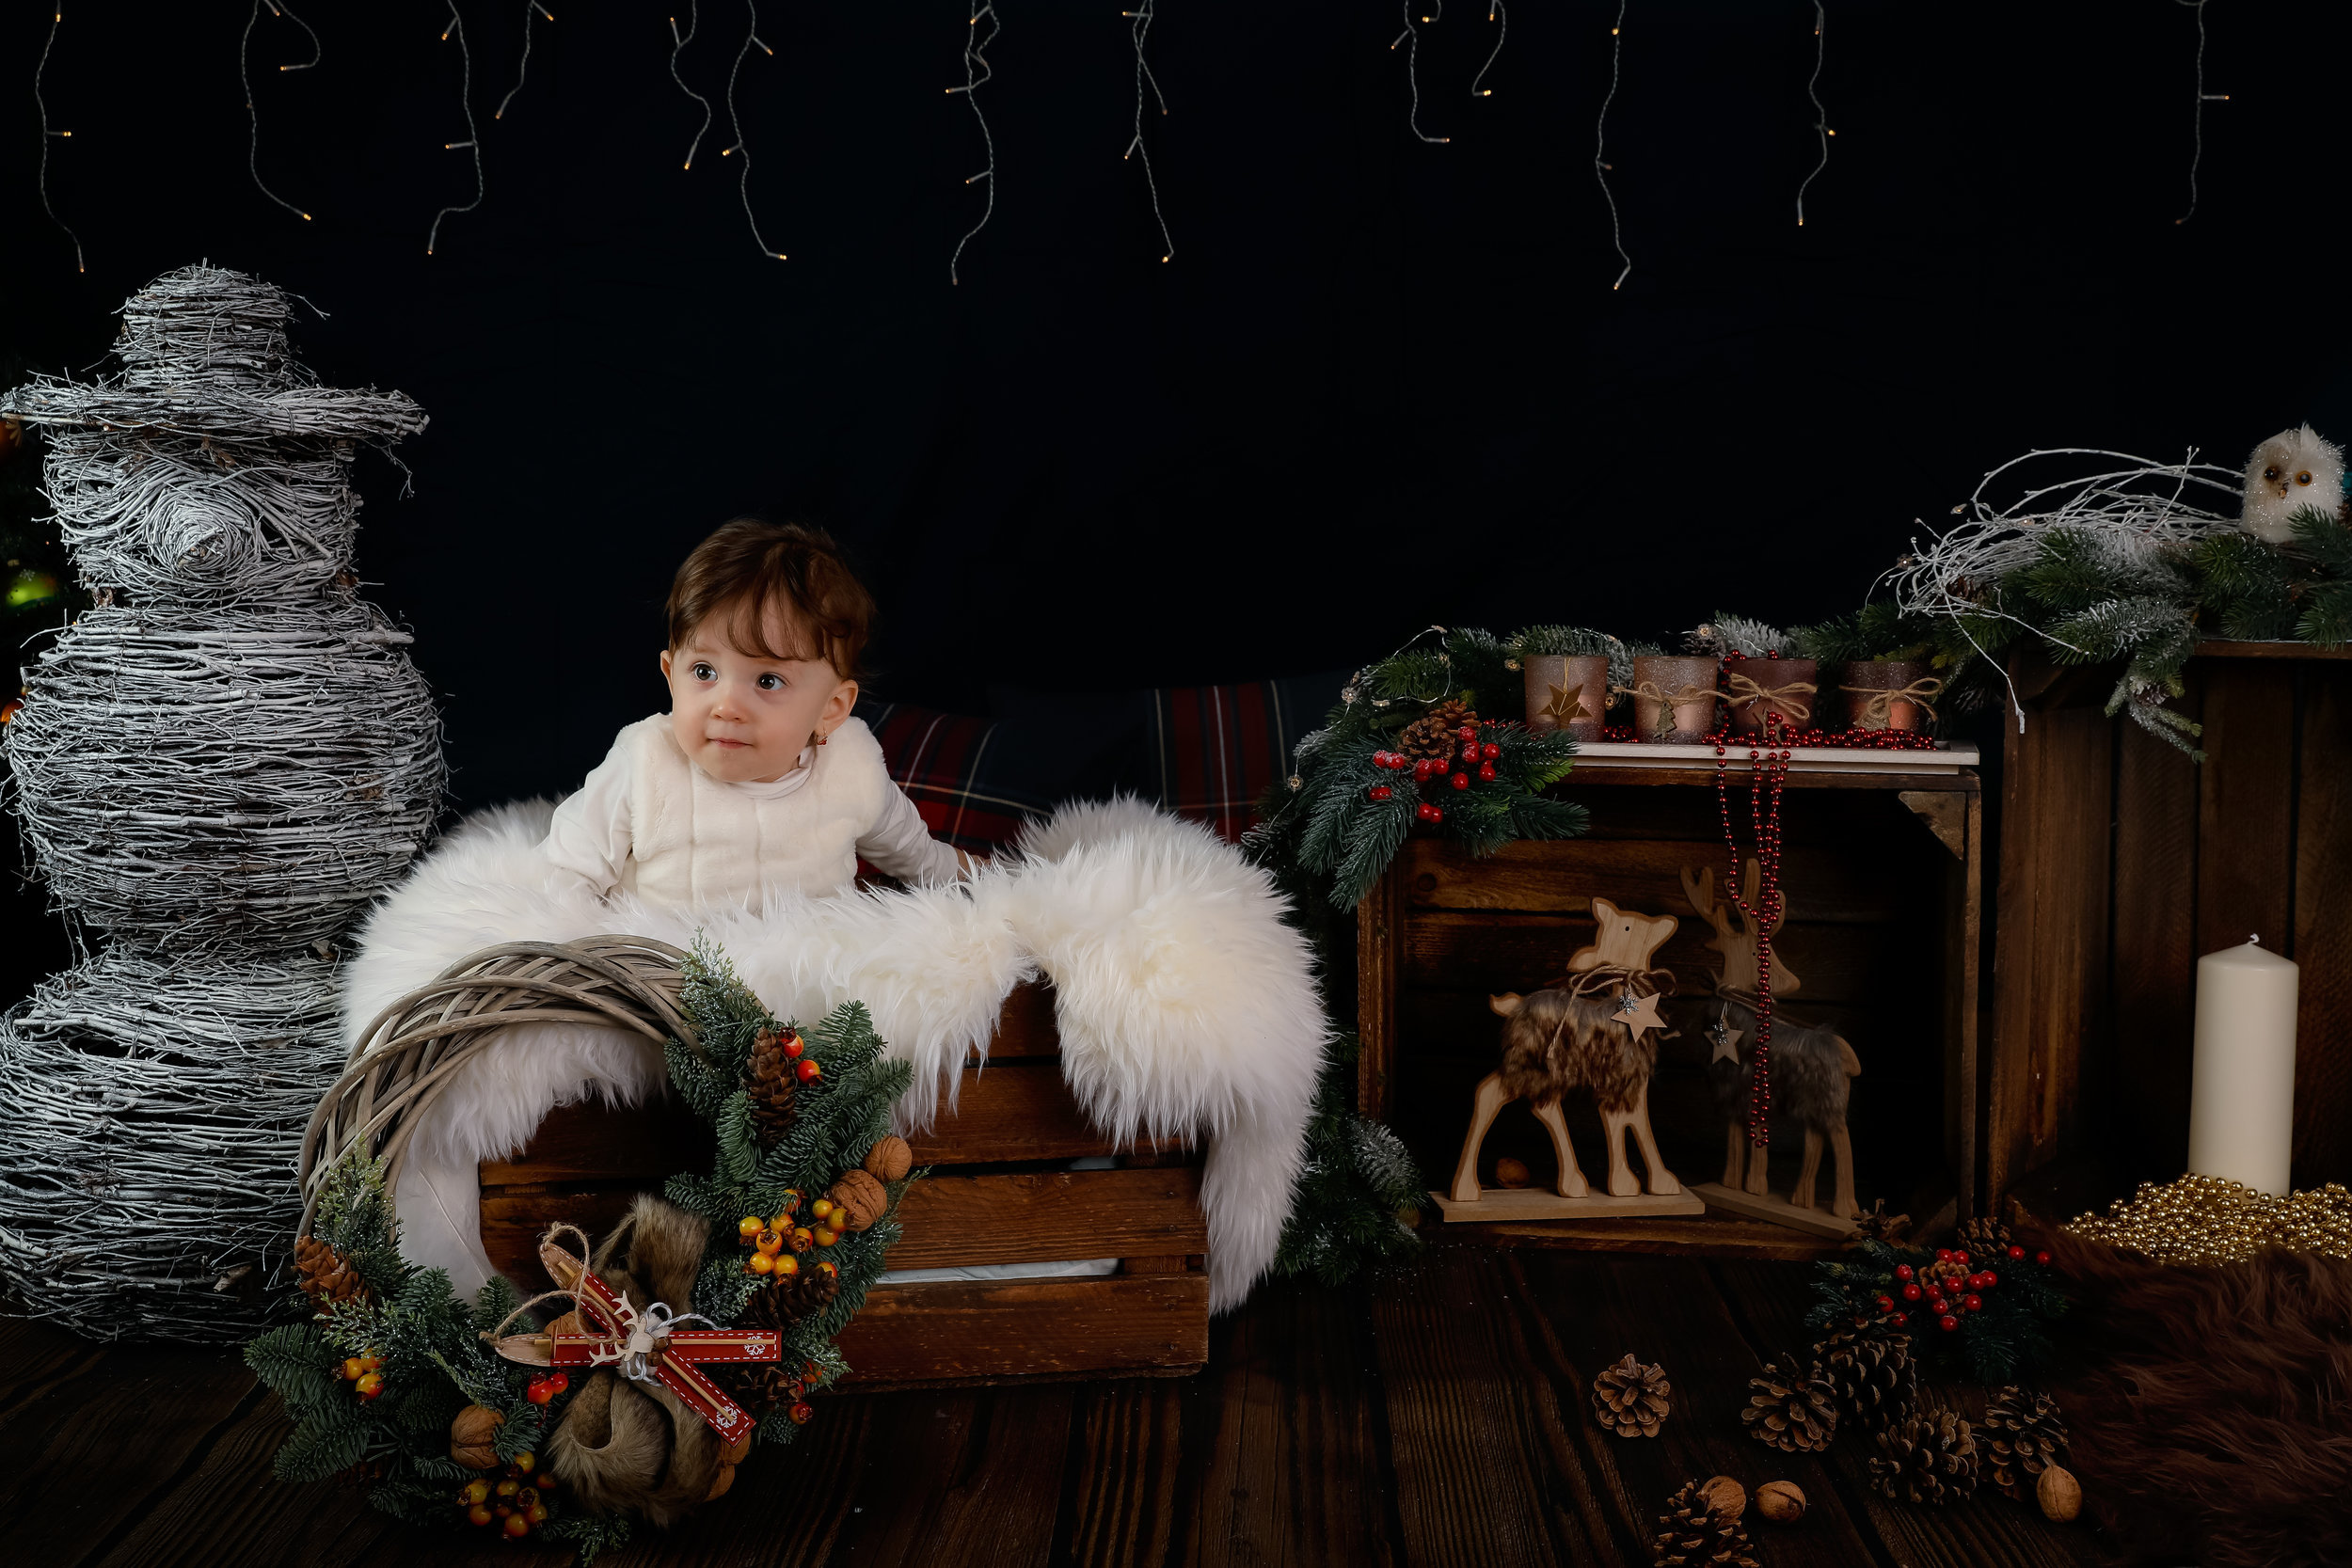 Vianoce10Upr-6.jpg